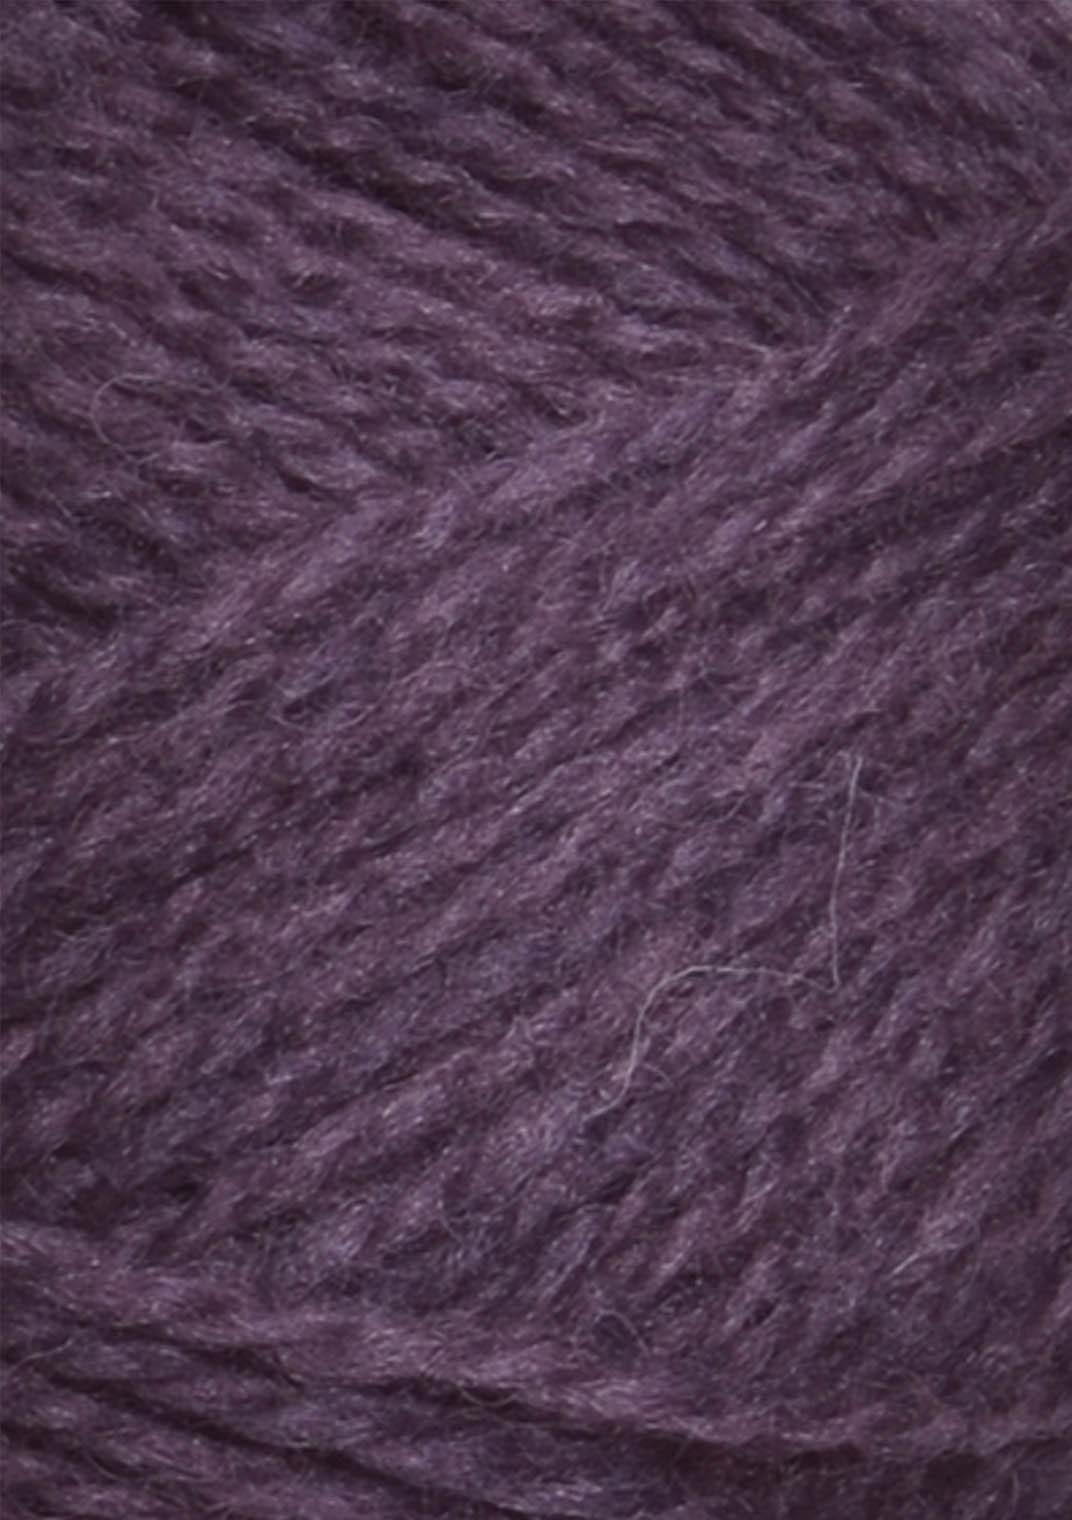 5072 Mørk lilla Tove Sandnes Garn